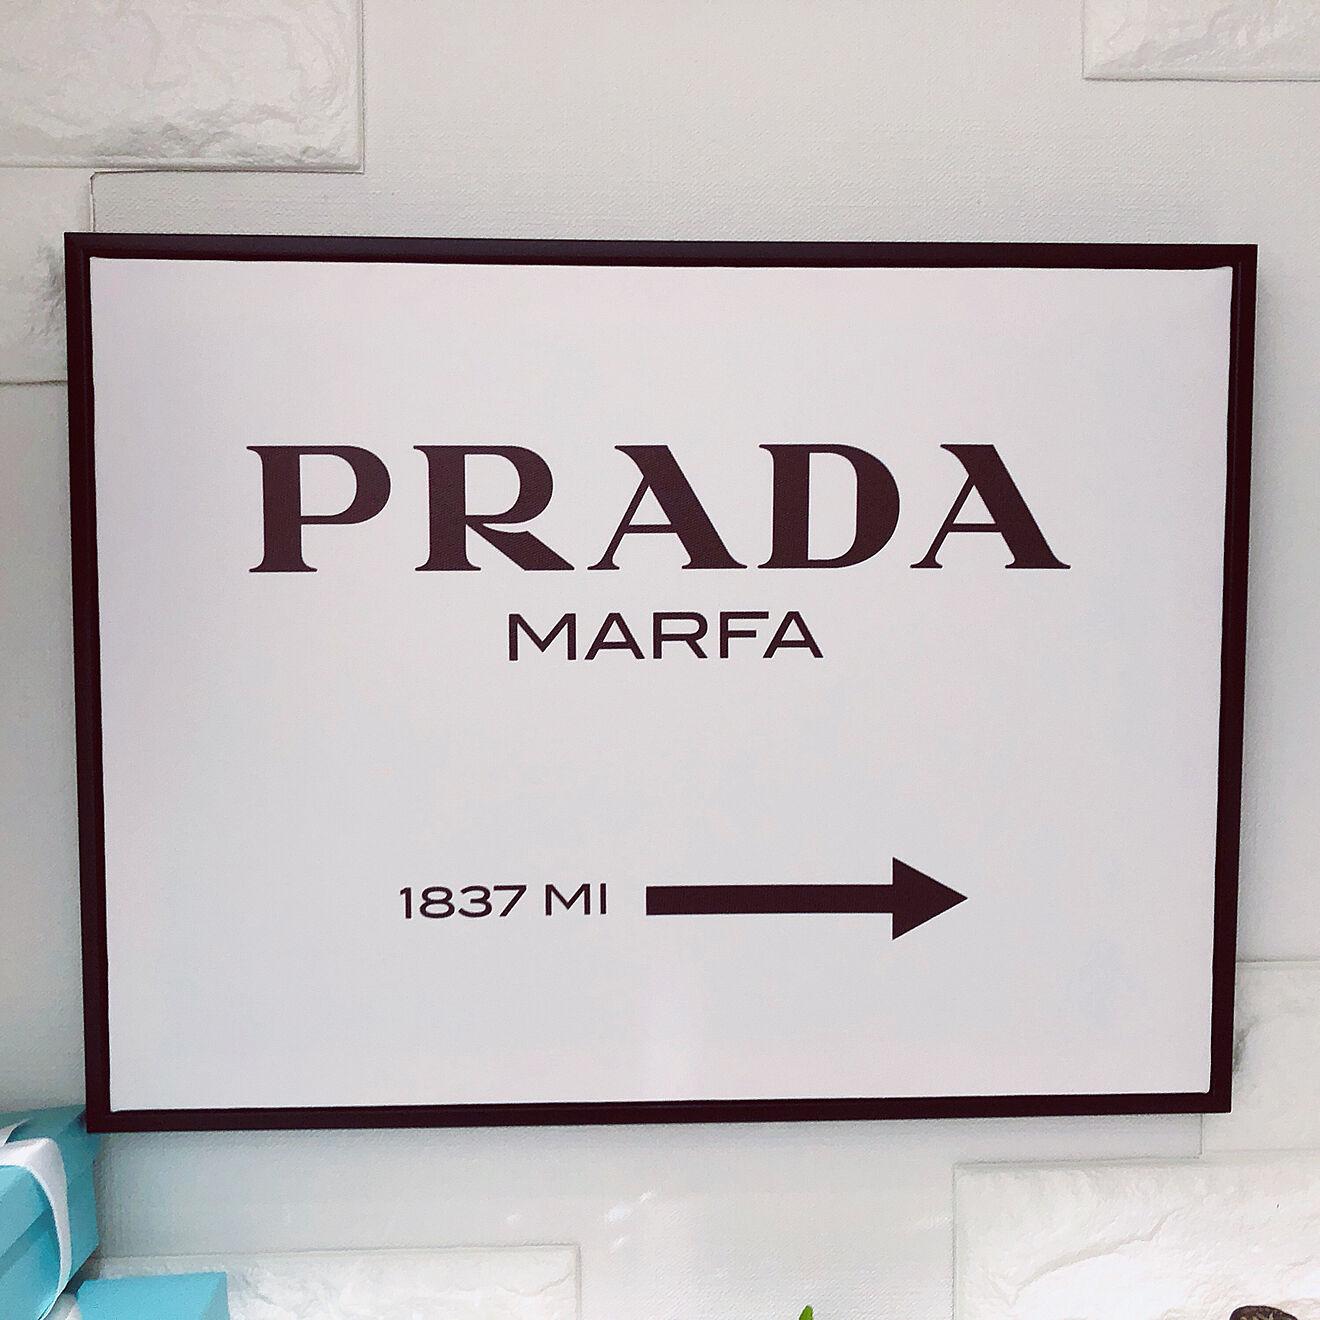 PRADA(プラダ)の人気メンズバッグを徹底調査!おすすめ商品もご紹介! アイキャッチ画像